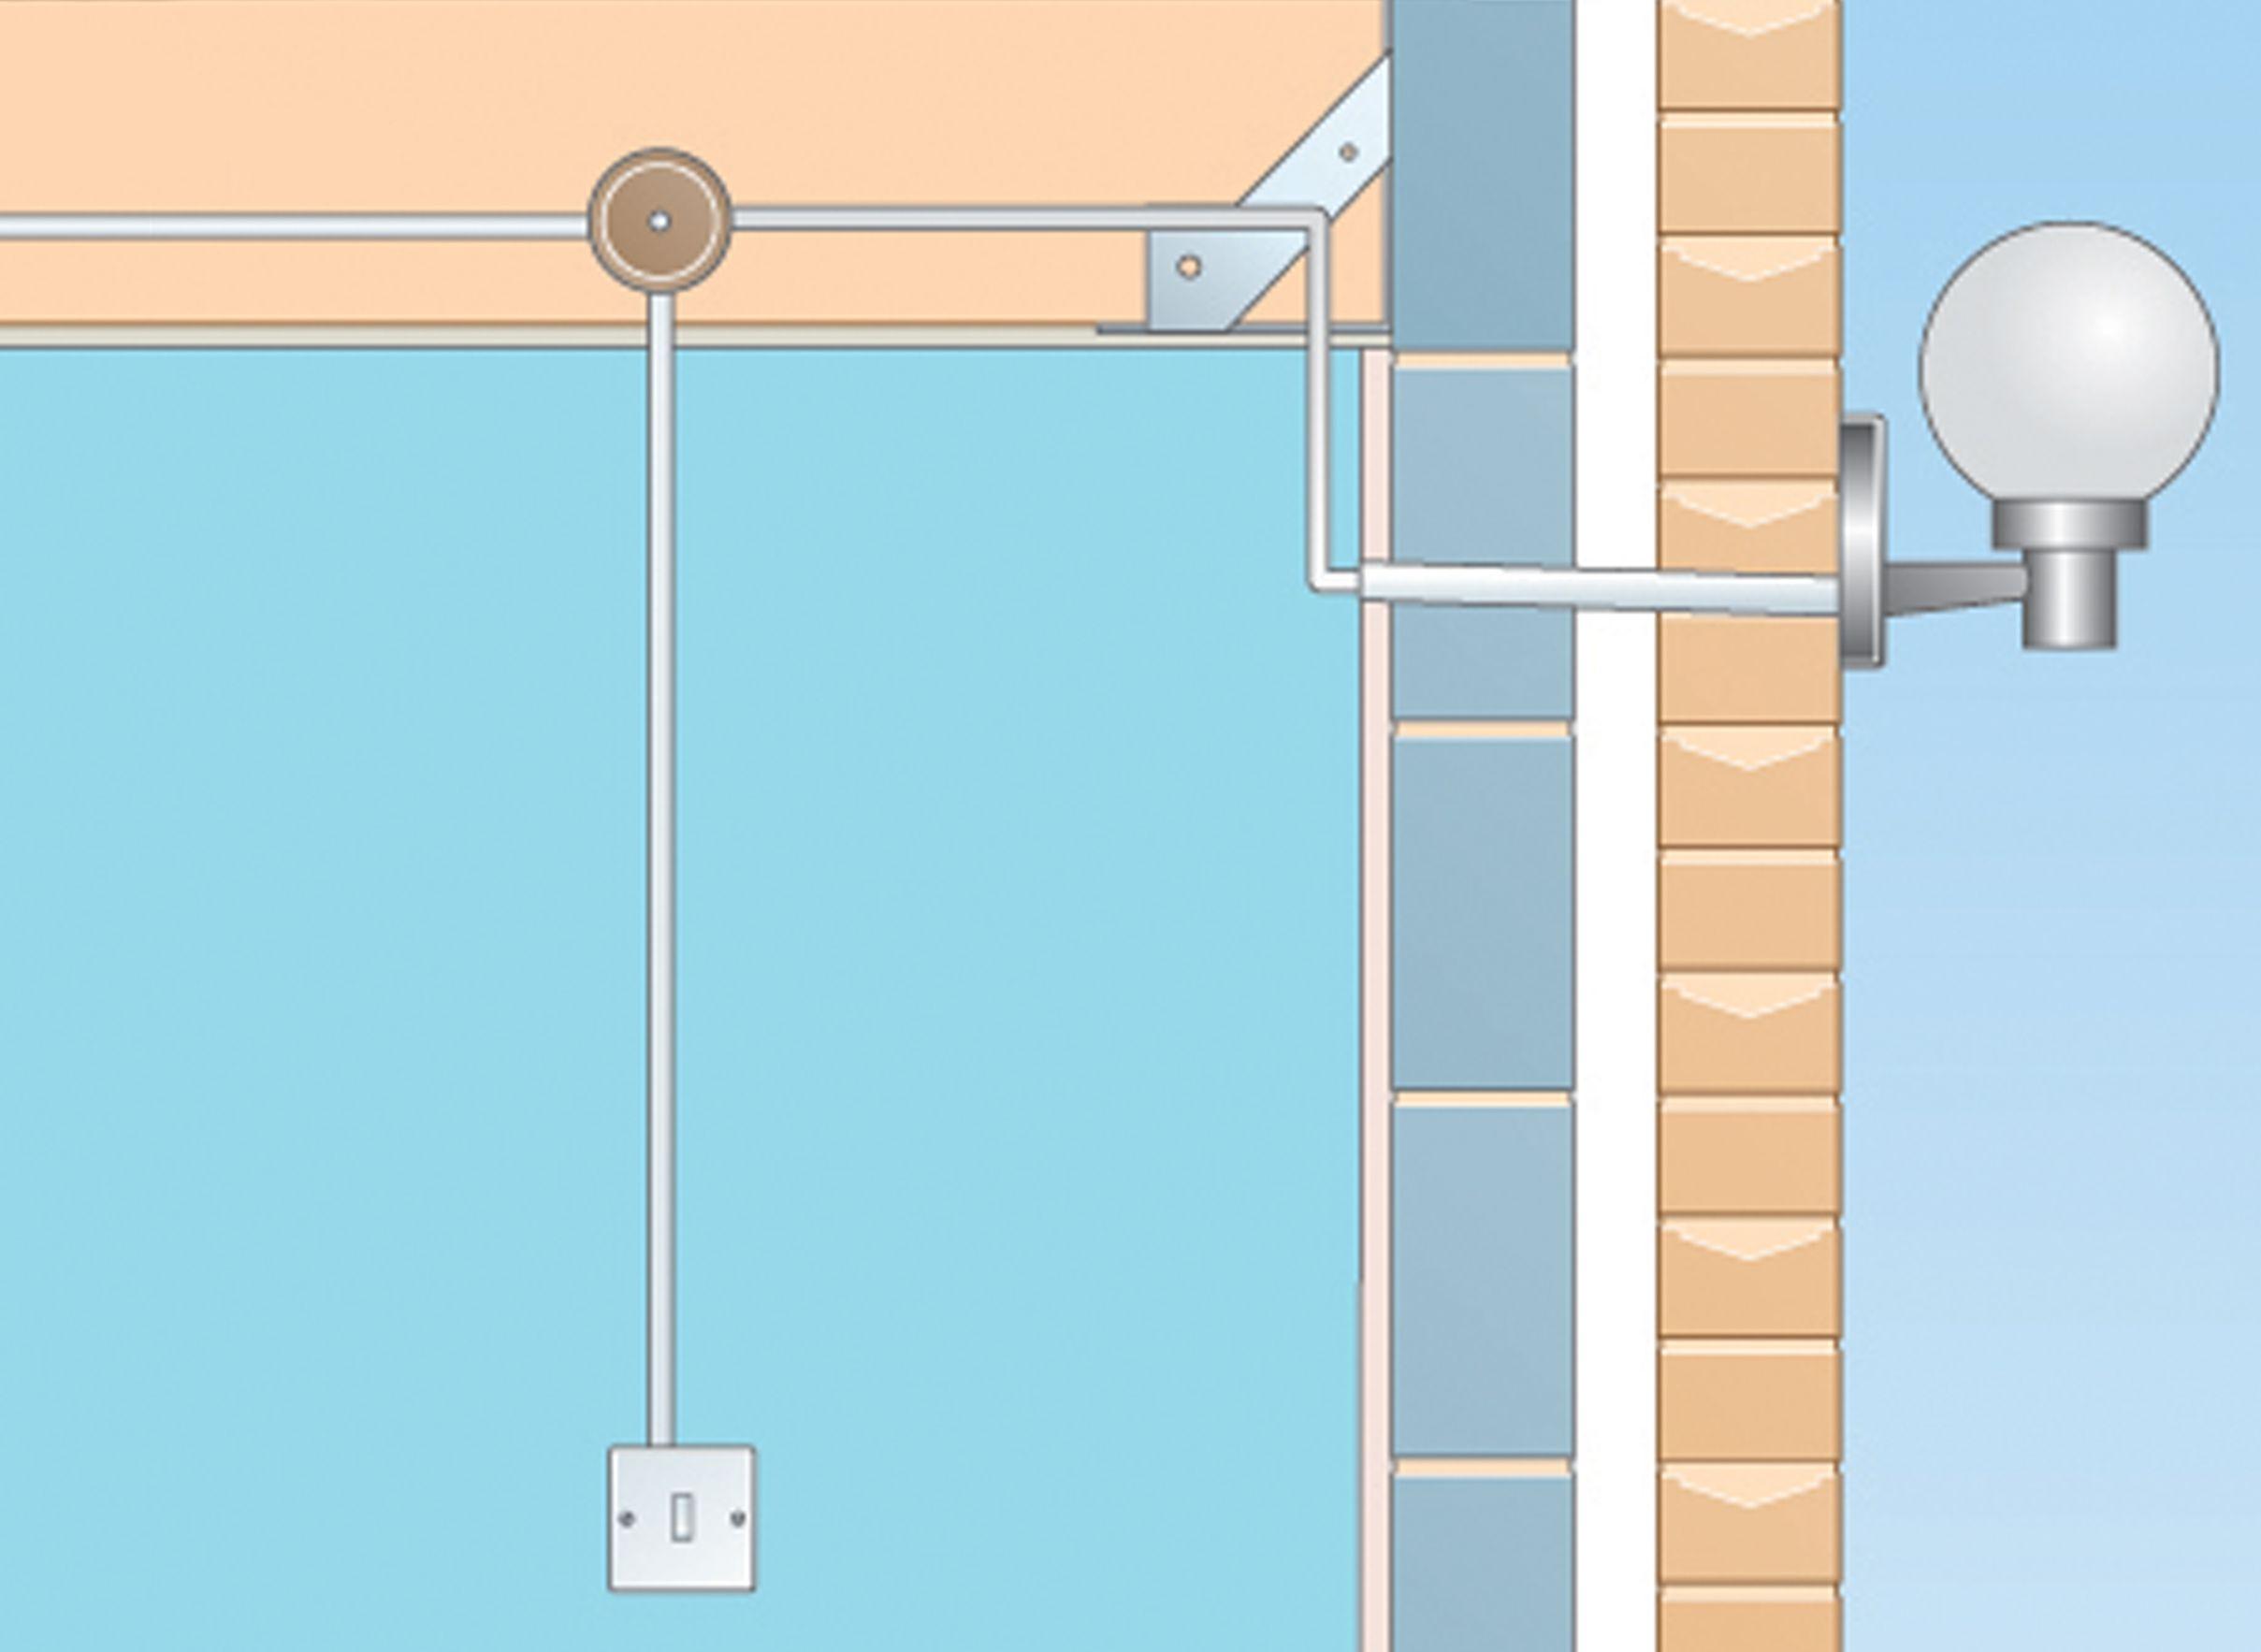 Outside Light Wiring Diagram Uk: Ideas 6 Advice ,Design